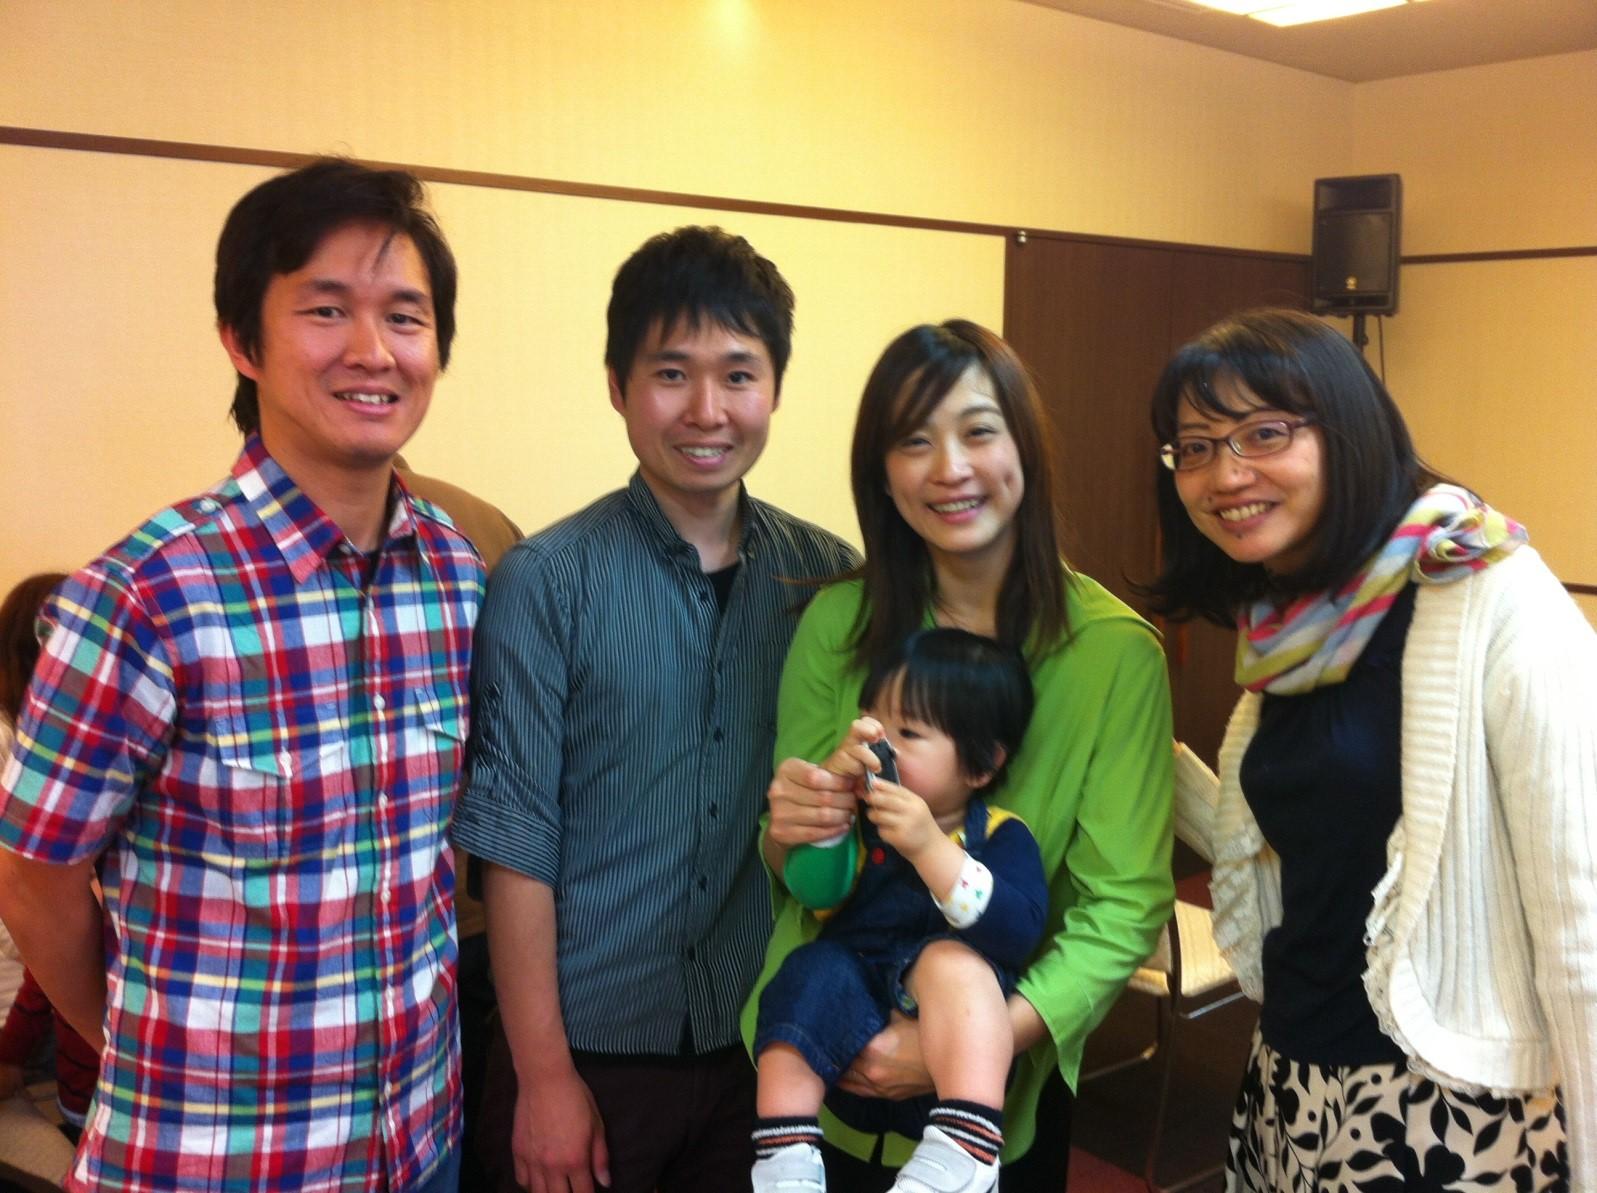 Kim, Gavin, and Hide in Japan: Experiencing More Grace